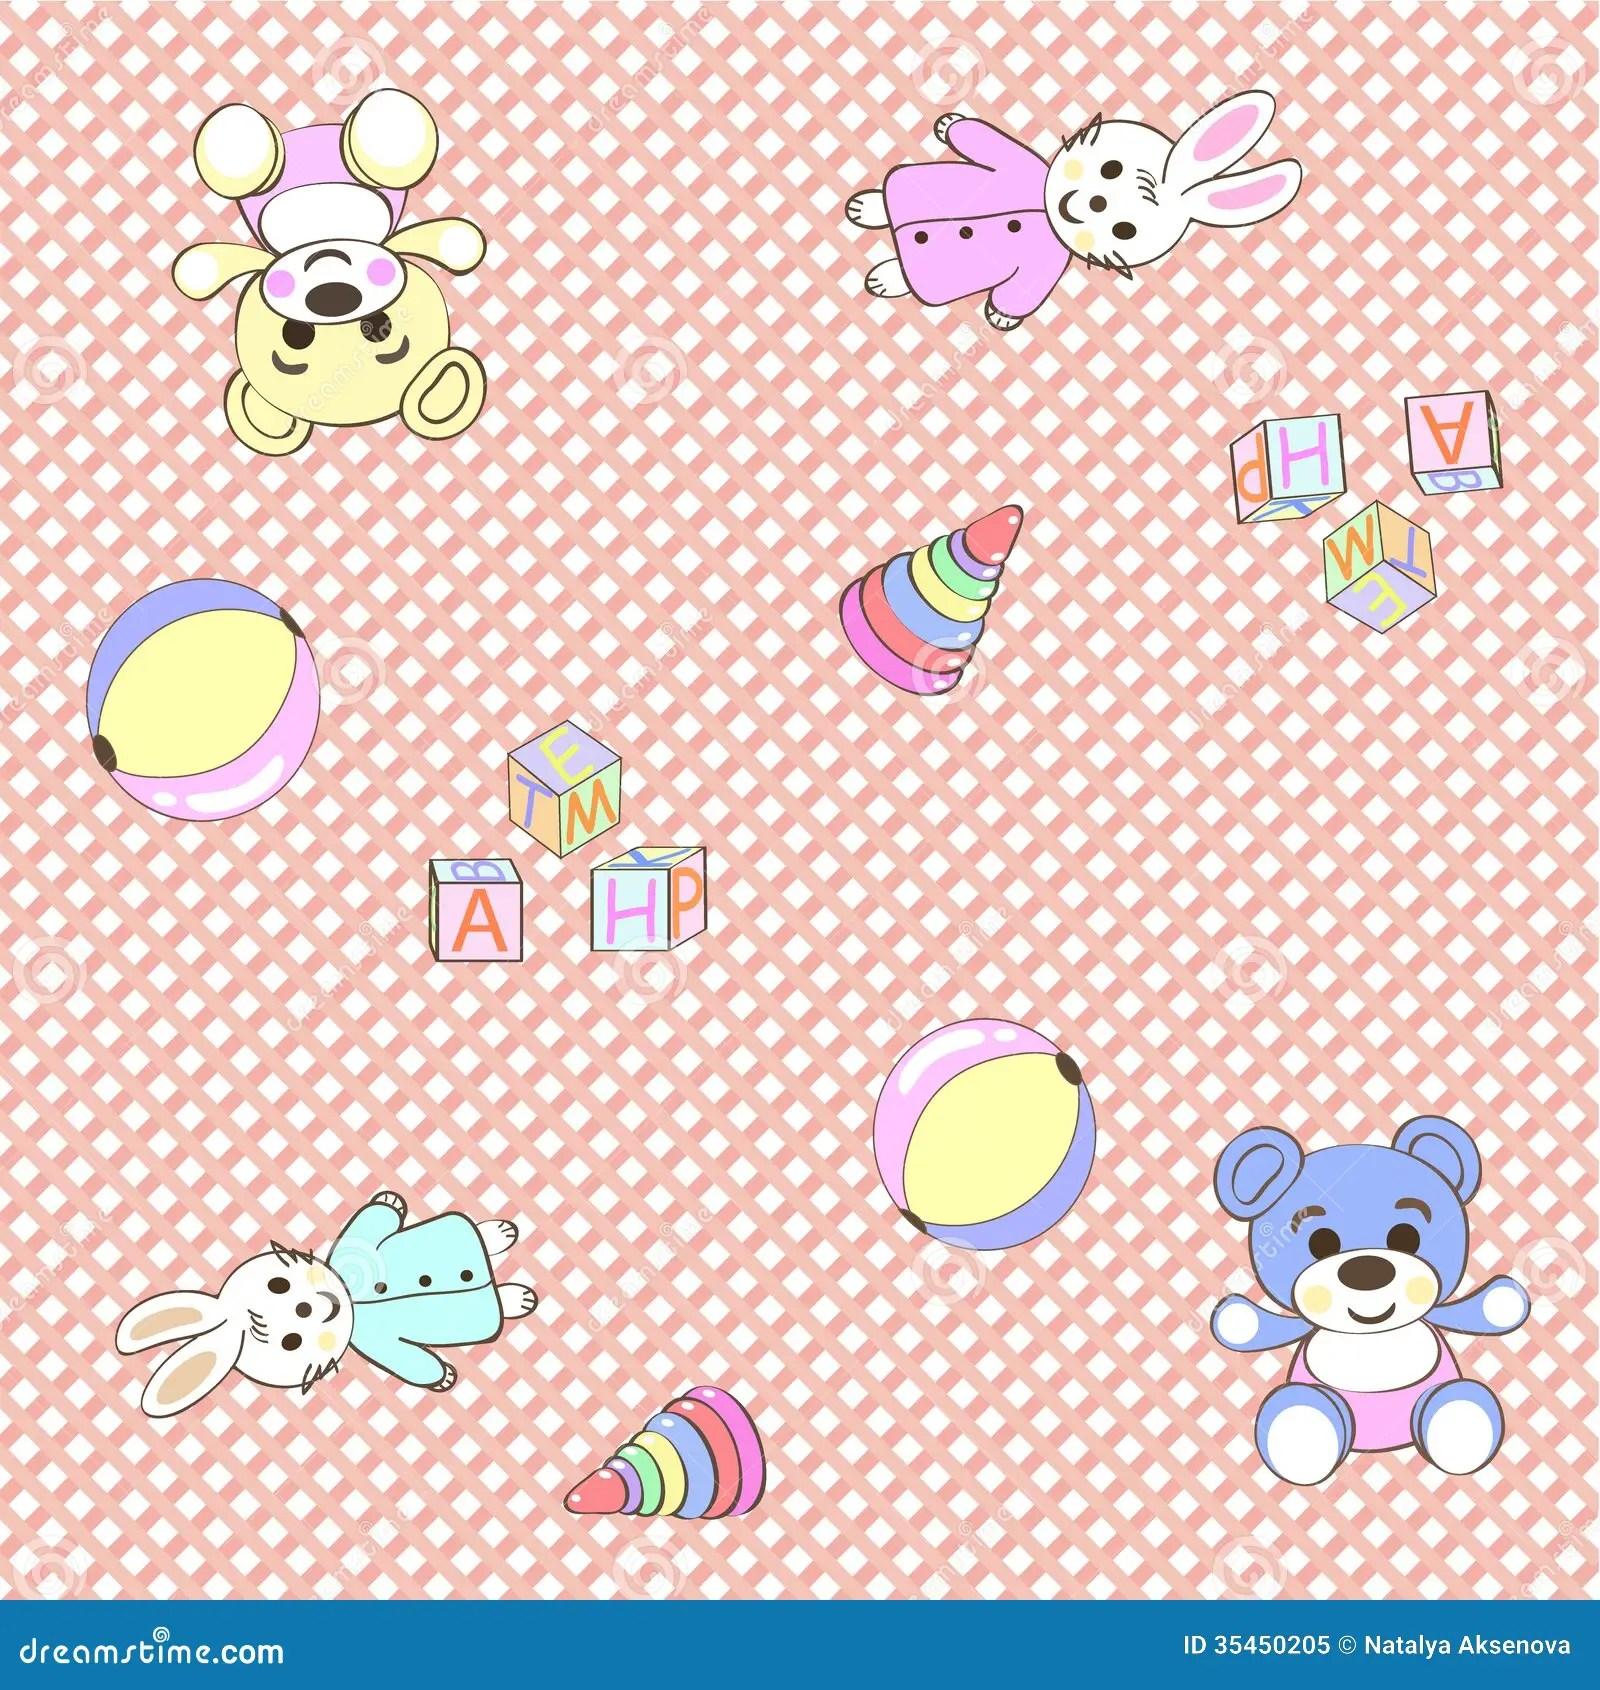 Cute Baby Girl Child Wallpaper Cheerful Children Wallpaper Illustration Texture Royalty